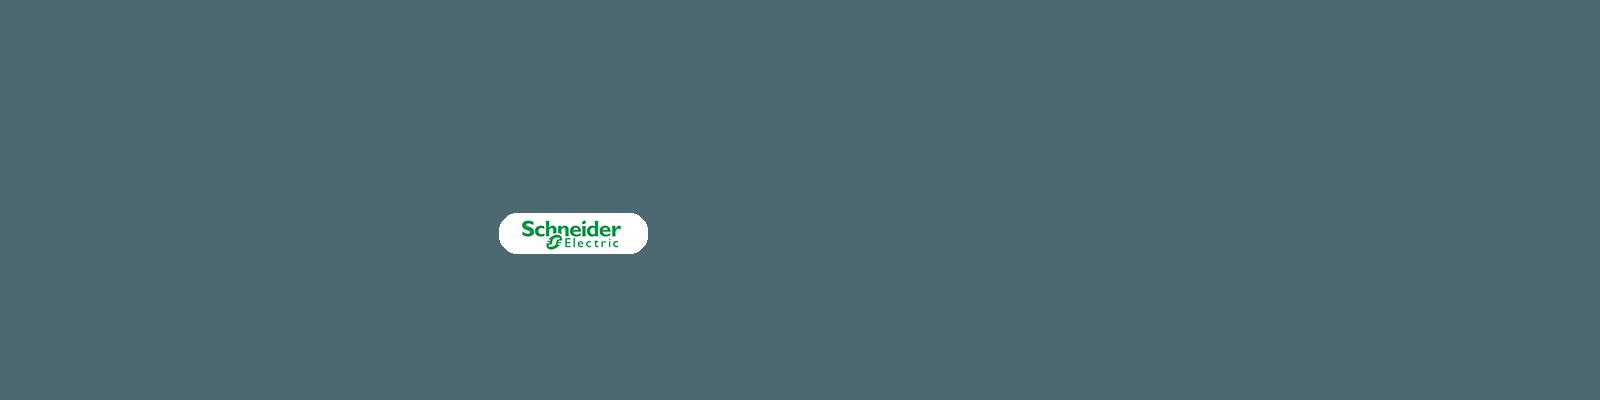 فروش محصولات schneider